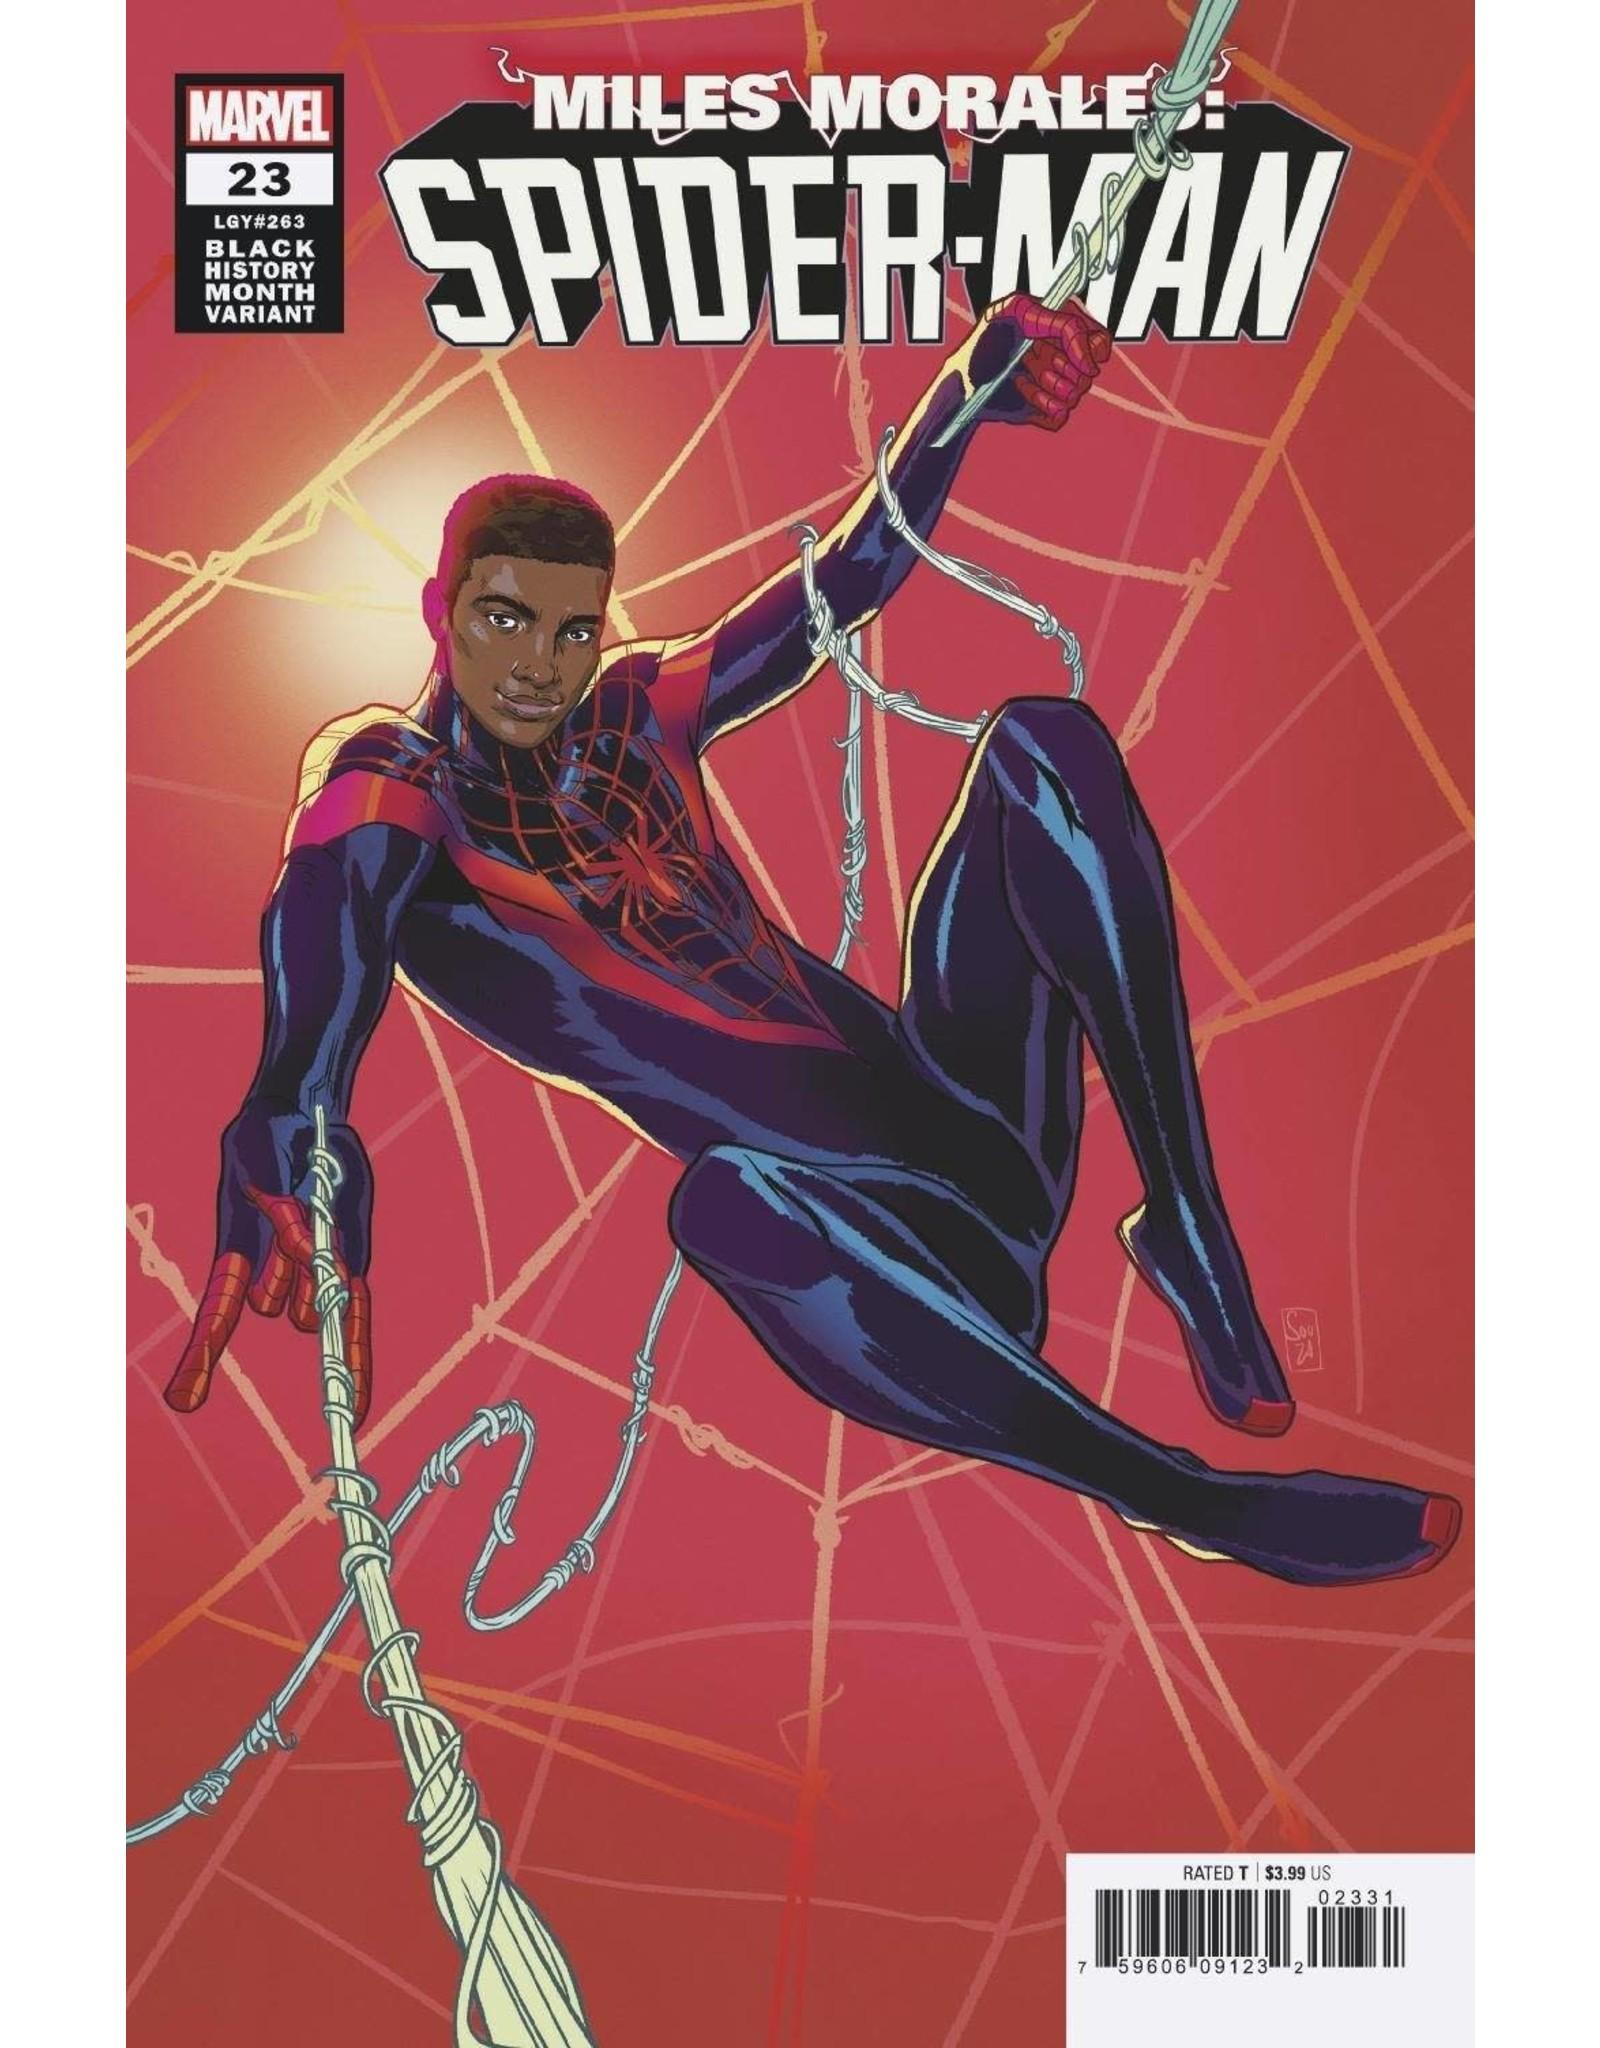 Marvel Comics MILES MORALES SPIDER-MAN #23 SOUZA BLACK HISTORY VAR KIB